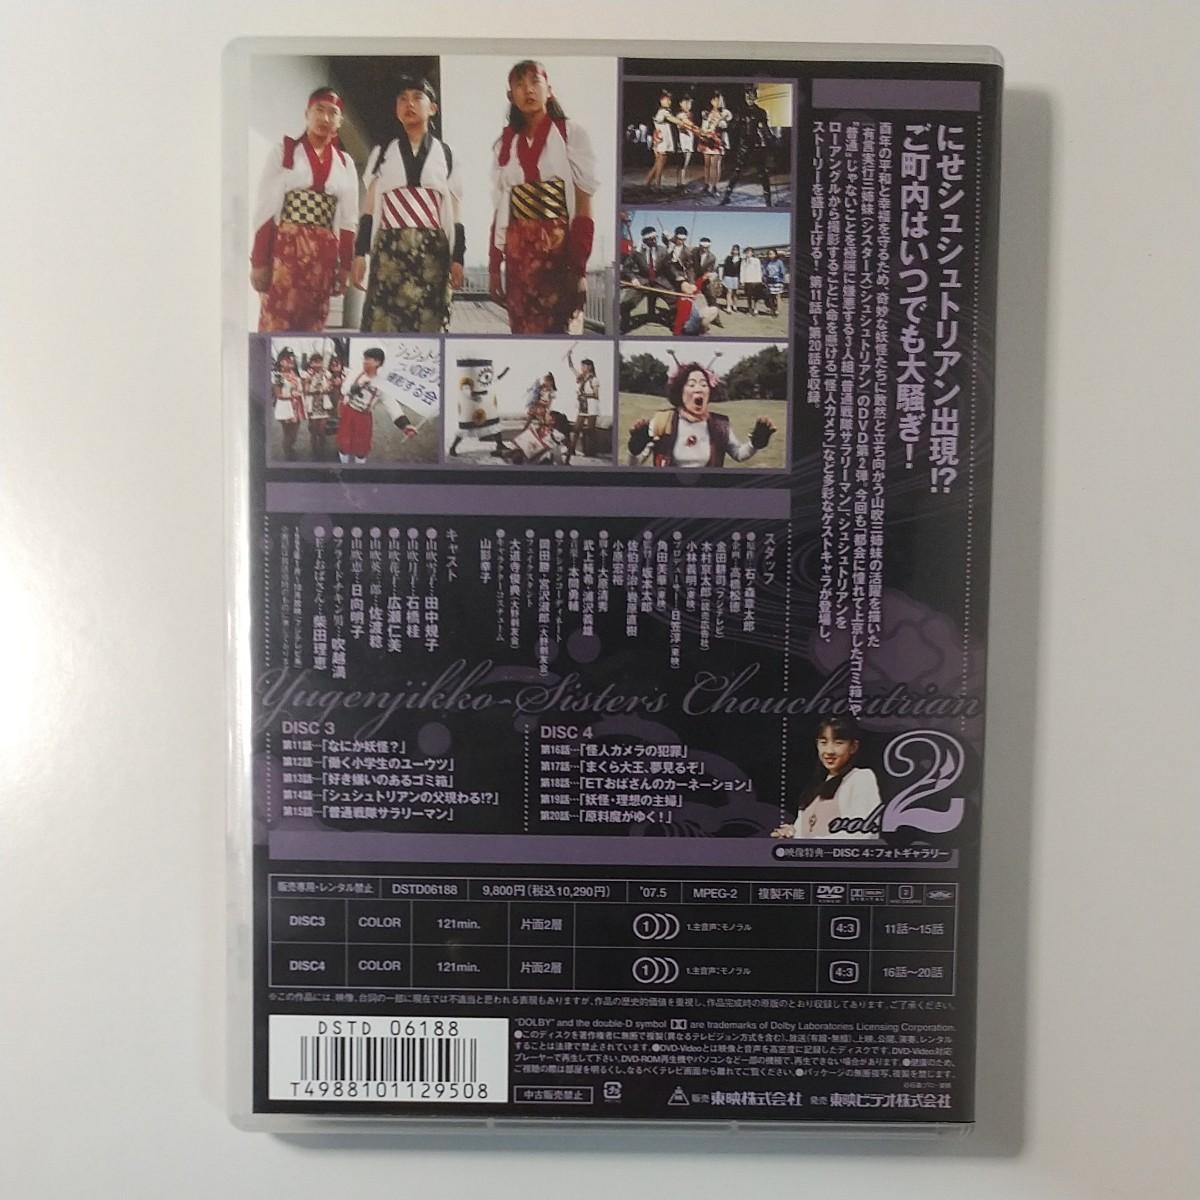 DVD 初回限定盤 解説書付 有言実行三姉妹シュシュトリアン VOL.2  2枚組 10話収録